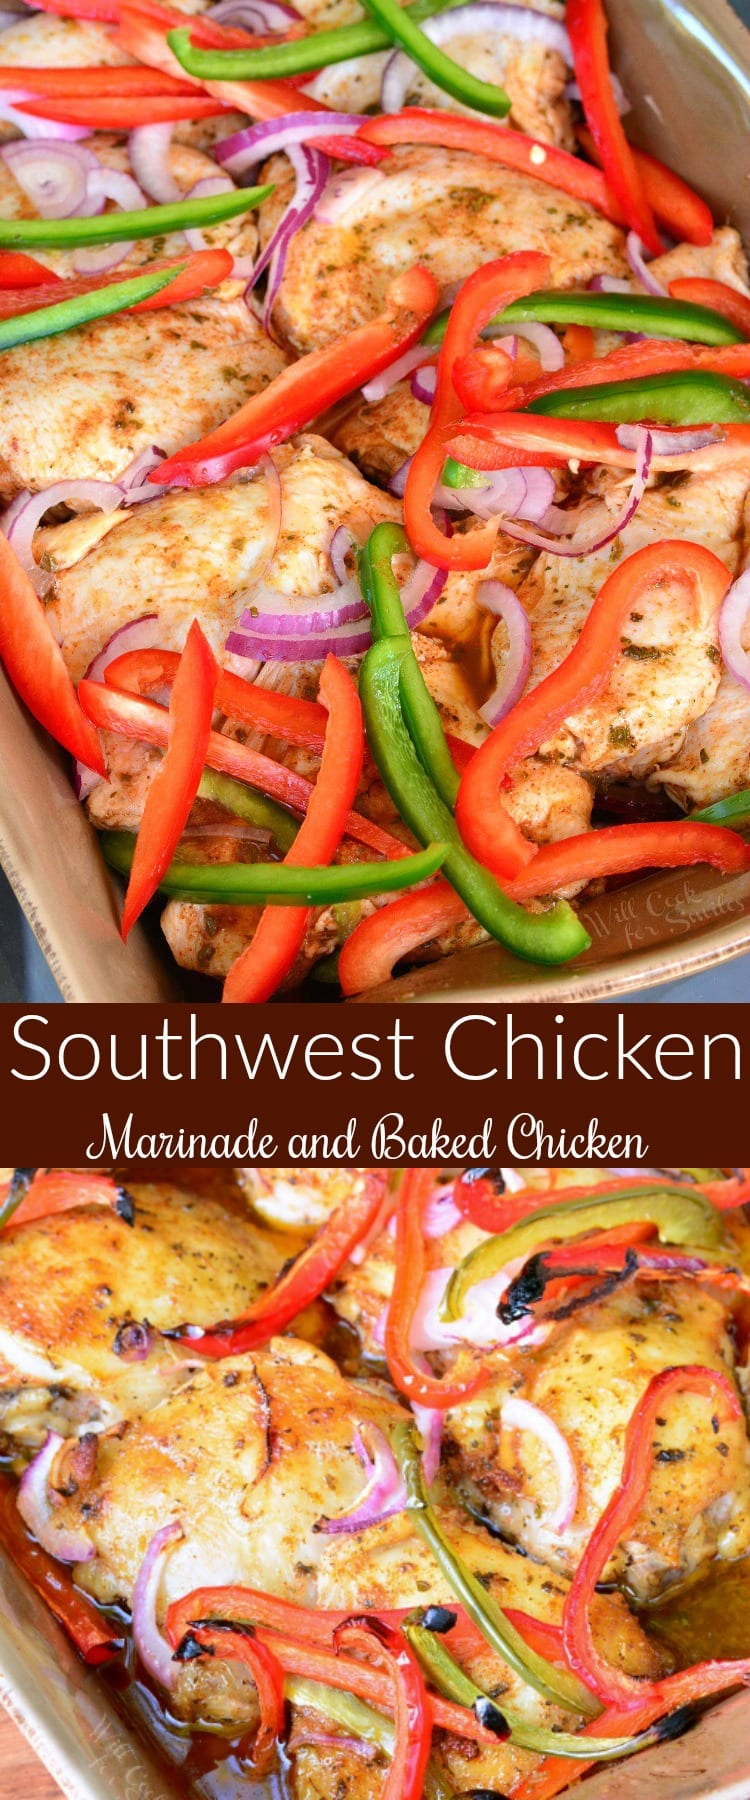 Southwest Chicken Marinade and Baked Chicken collage